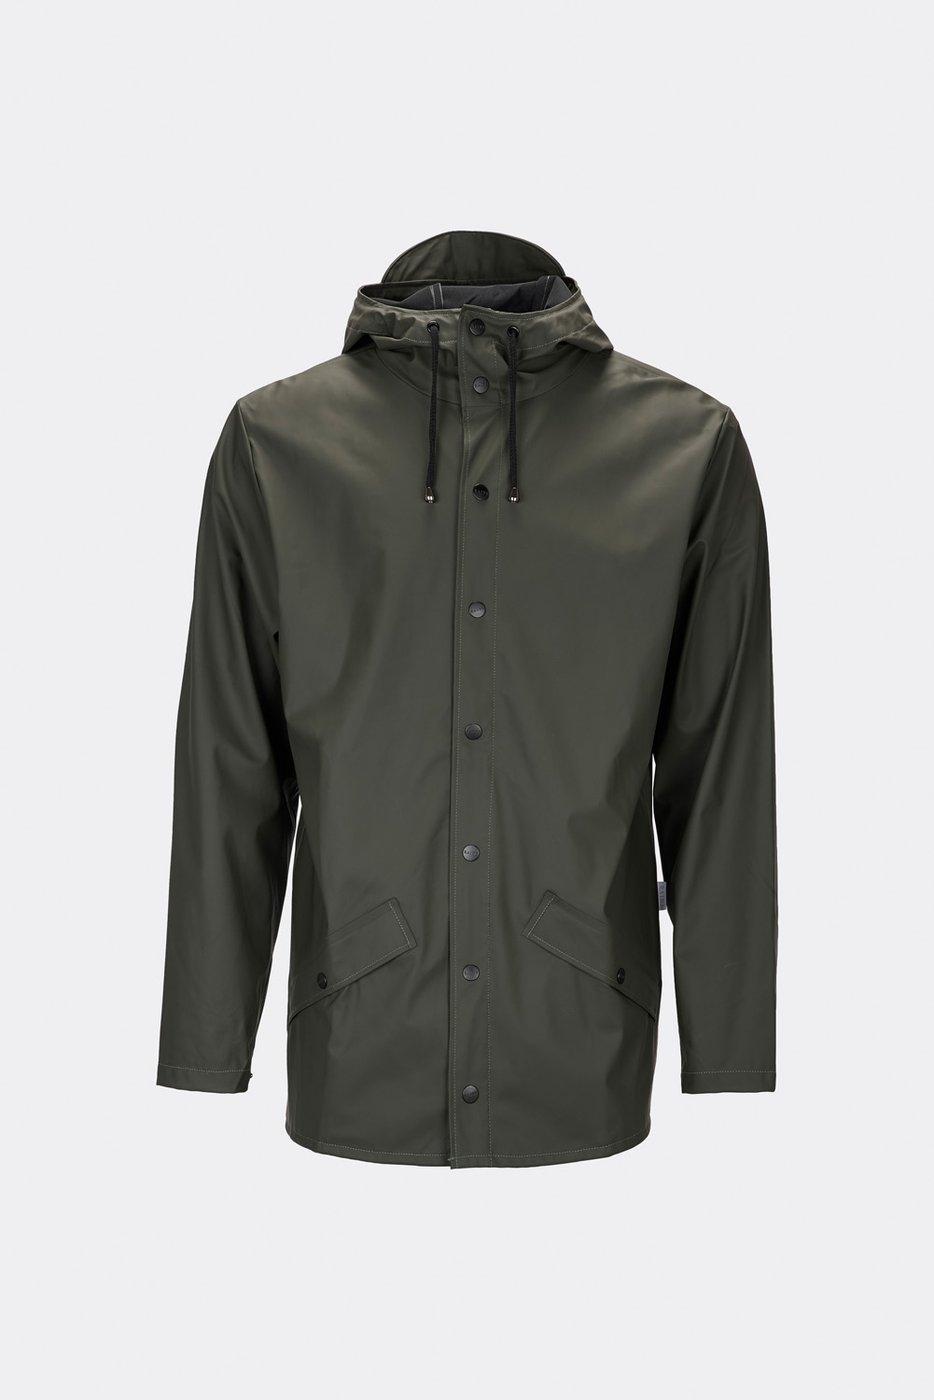 Rains Jacket green unisex XS/S